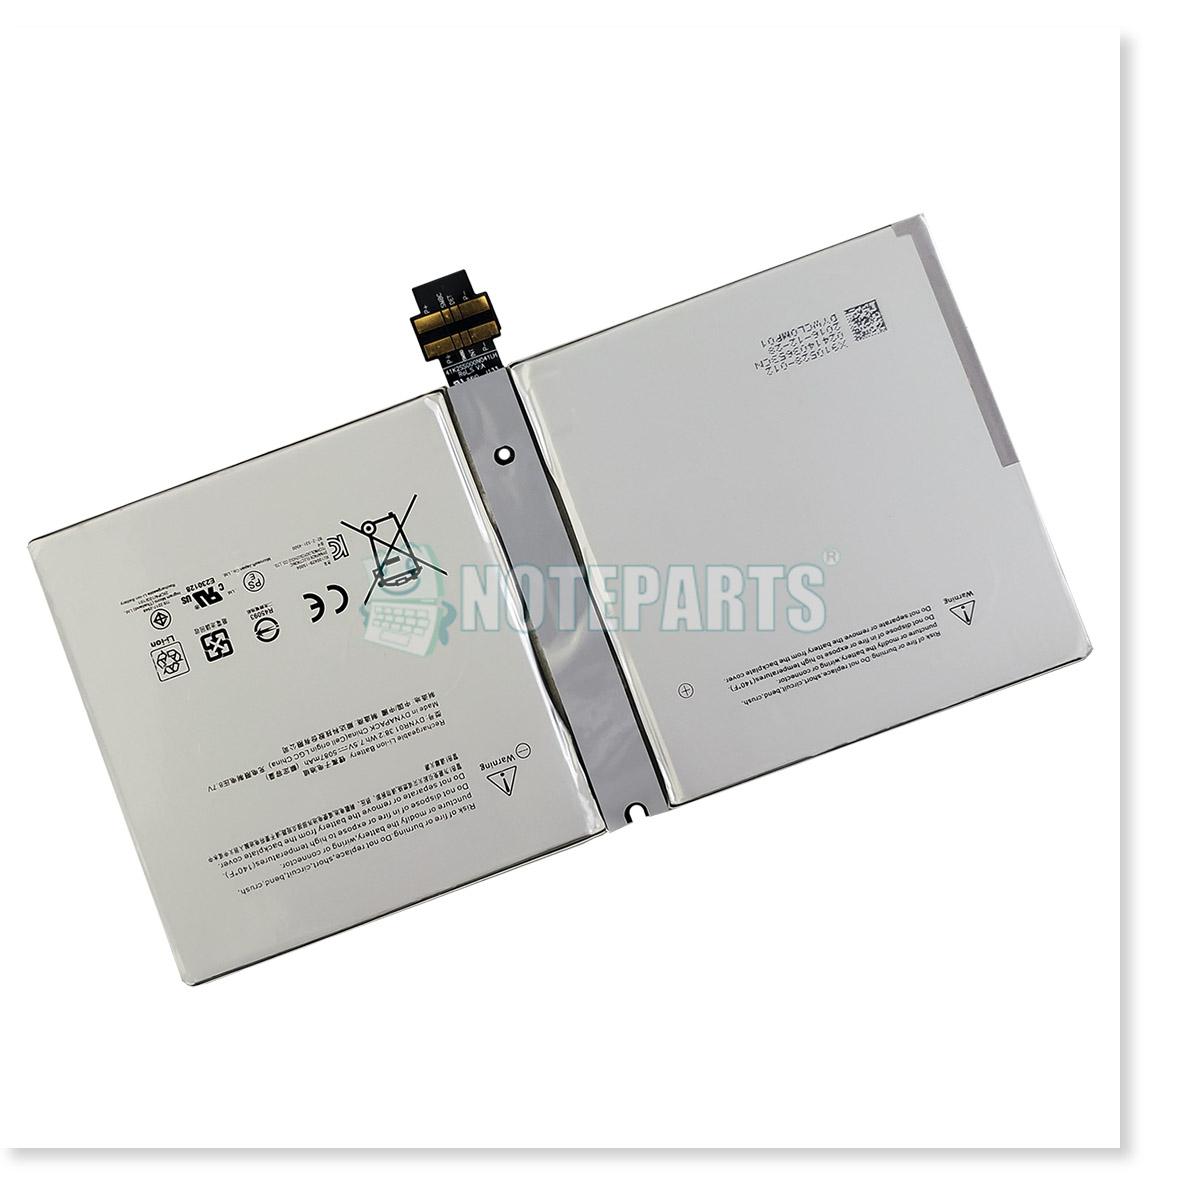 Microsoft純正 マイクロソフト Surface Pro 4 バッテリー G3HTA026H G3HTA027H DYNR01